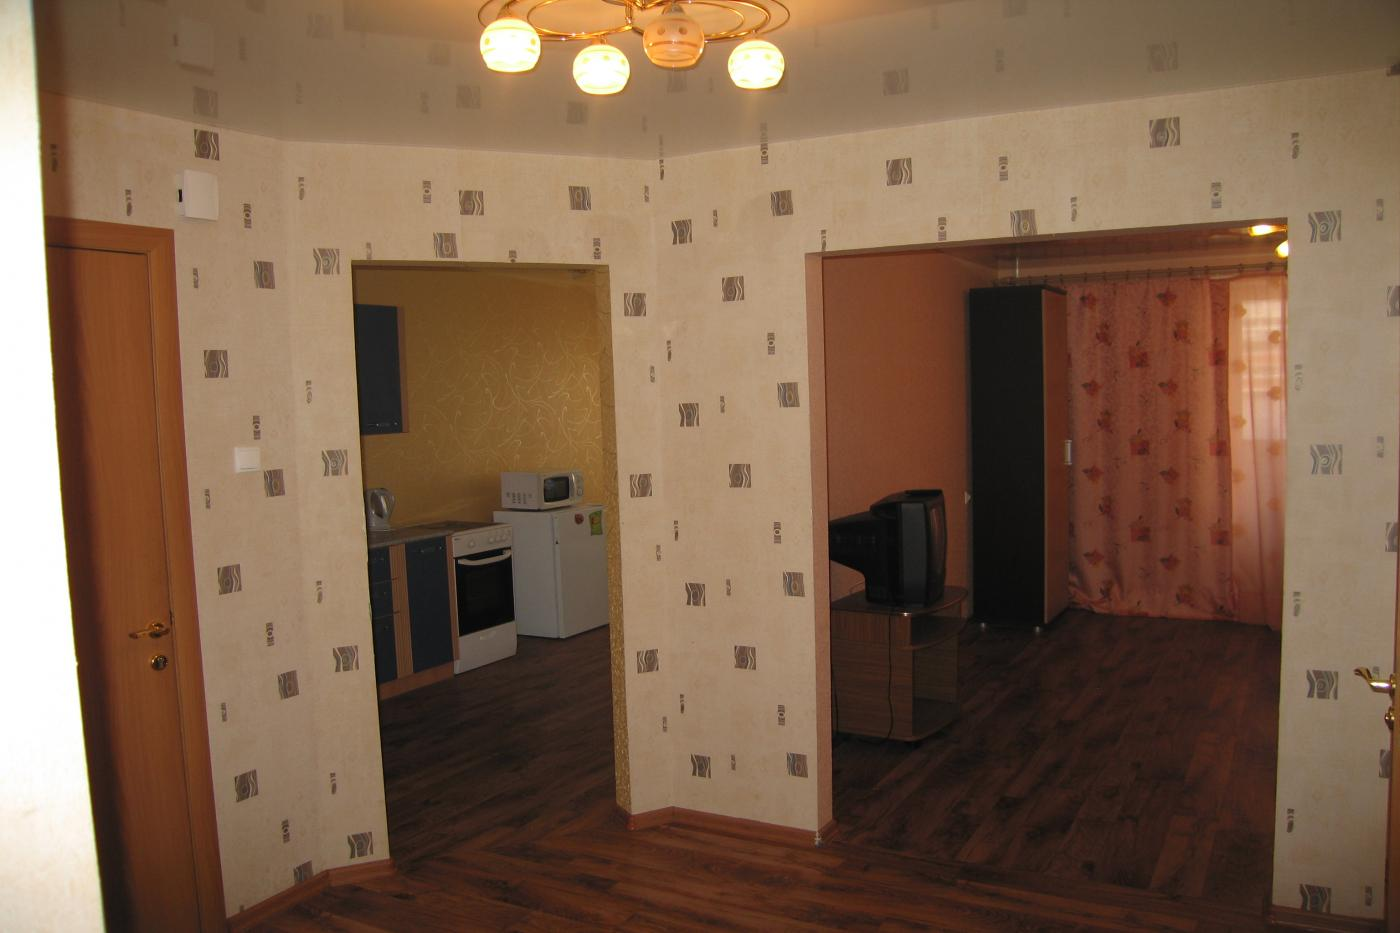 2-комнатная квартира посуточно (вариант № 2606), ул. Антонова-Овсеенко улица, фото № 3